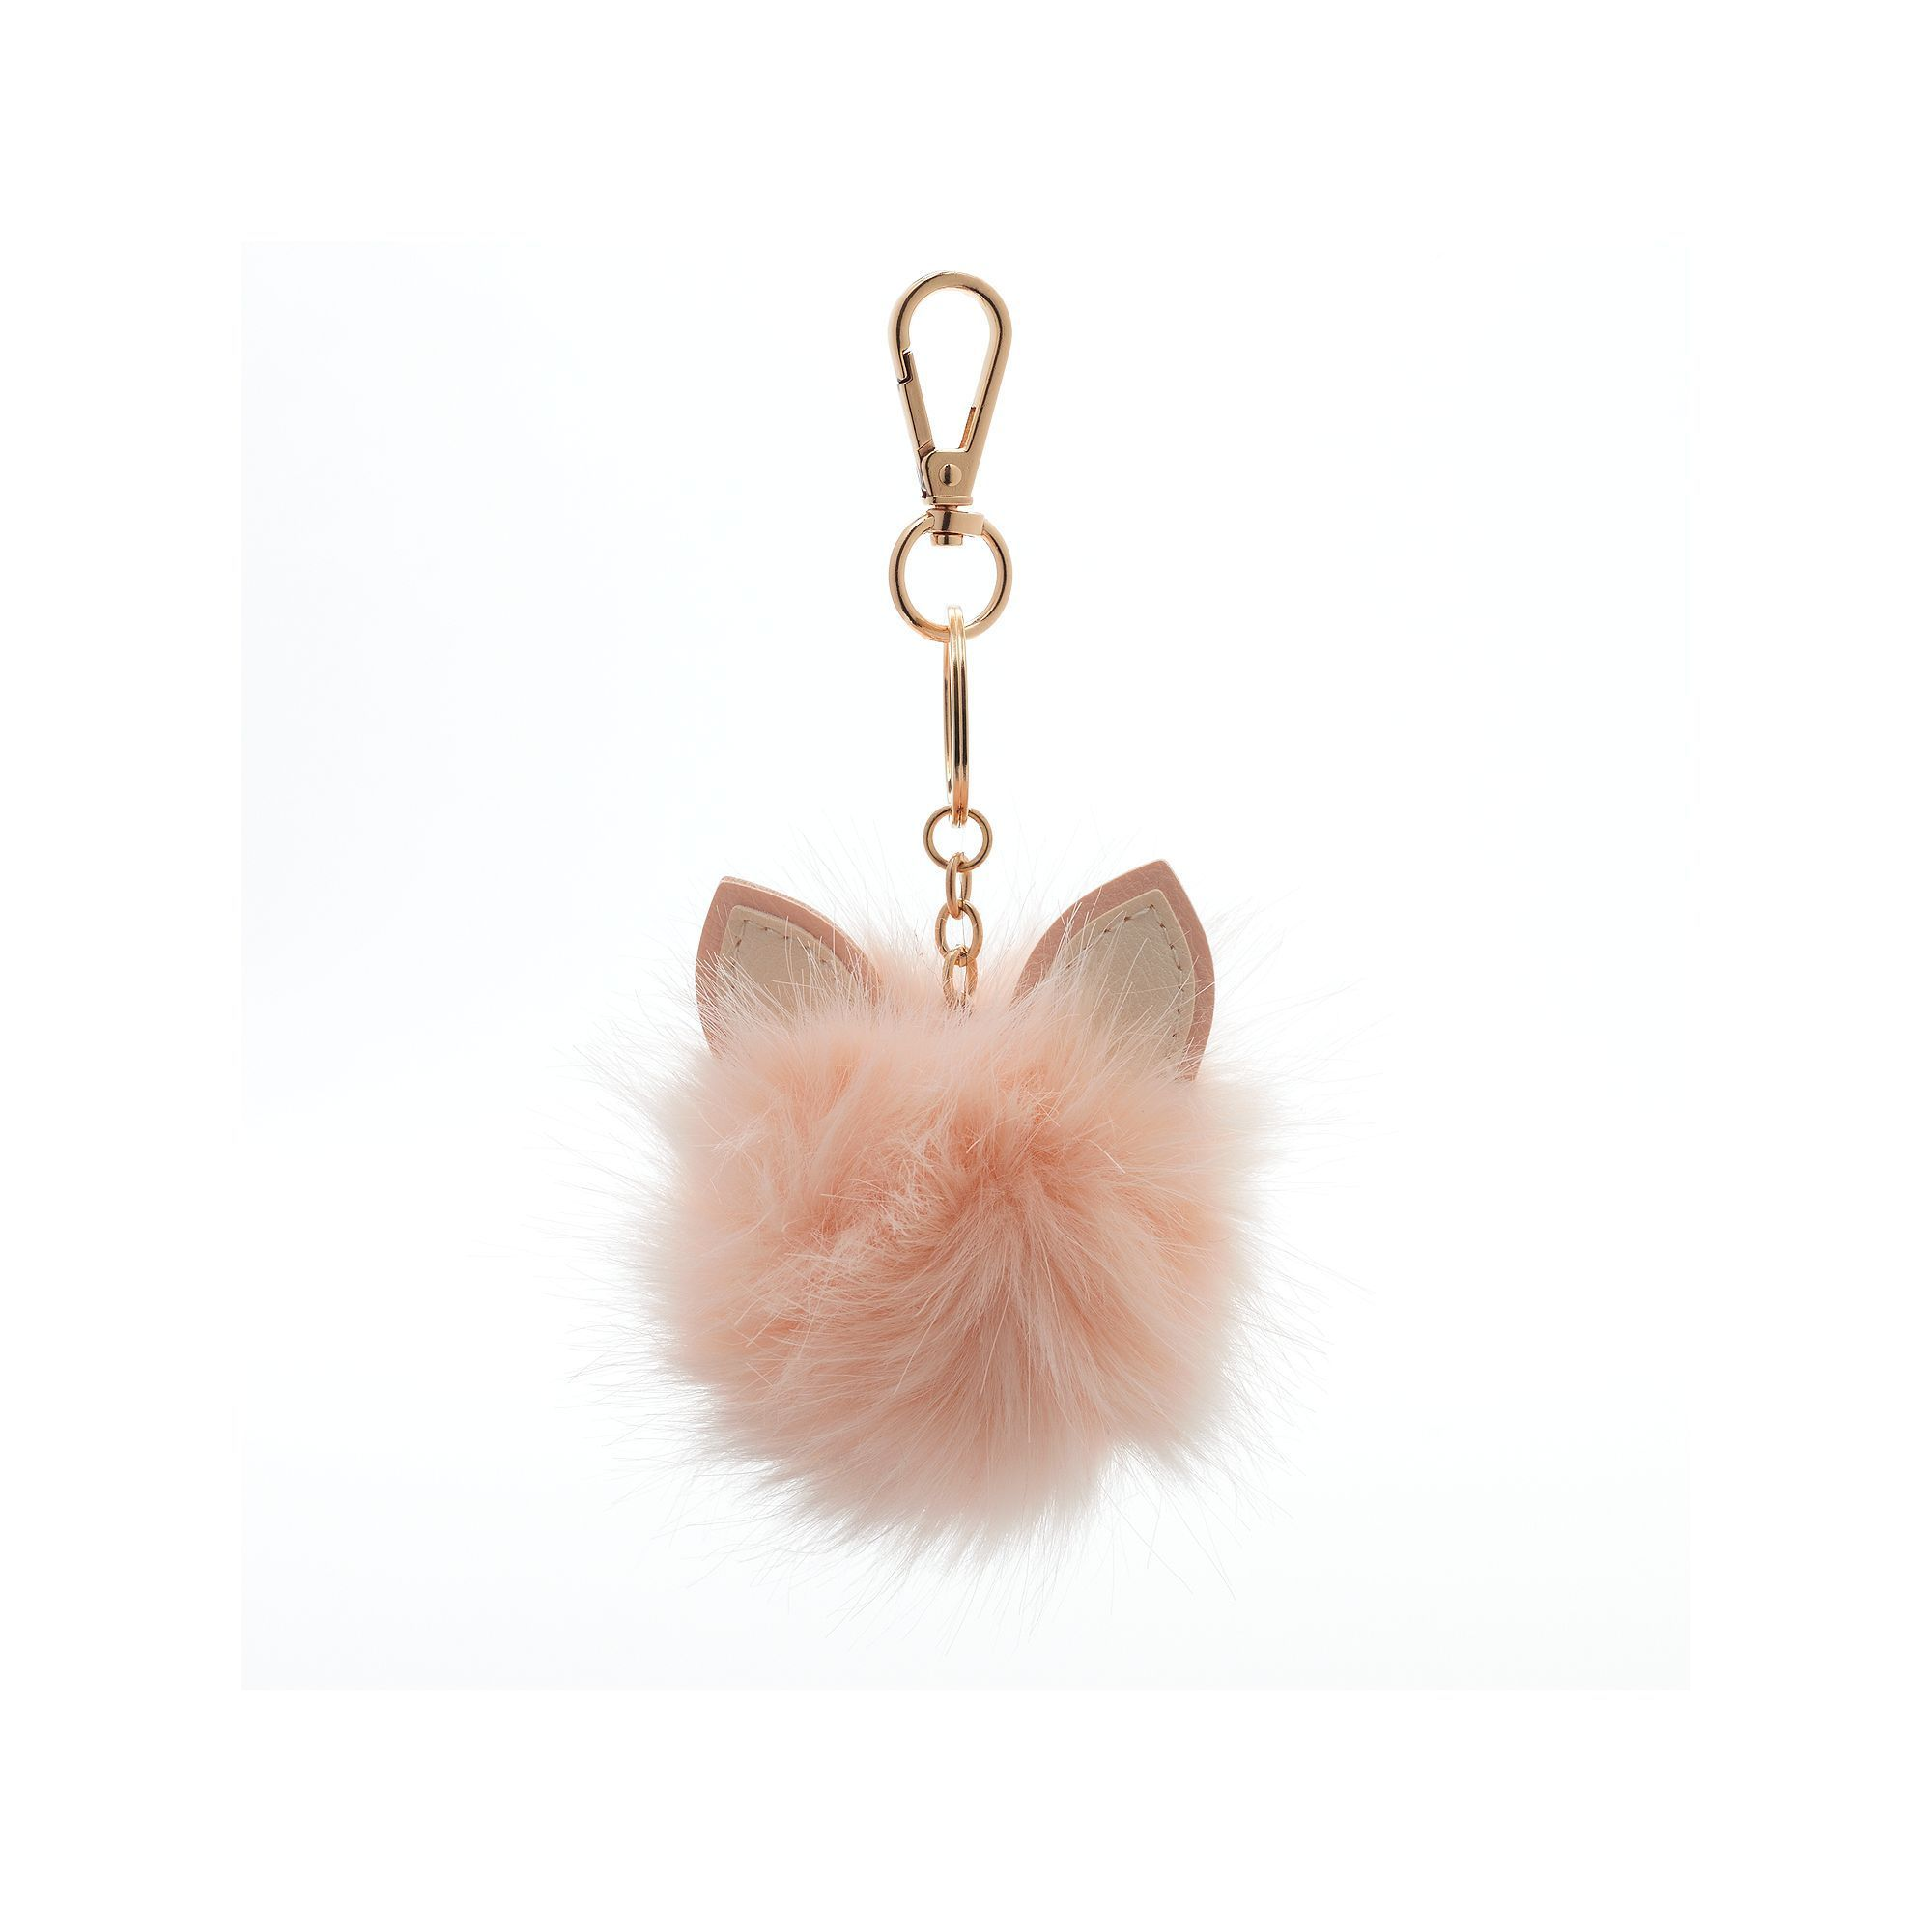 LC Lauren Conrad Cat Ear Faux Fur Pom Pom Key Chain  67eed82b66